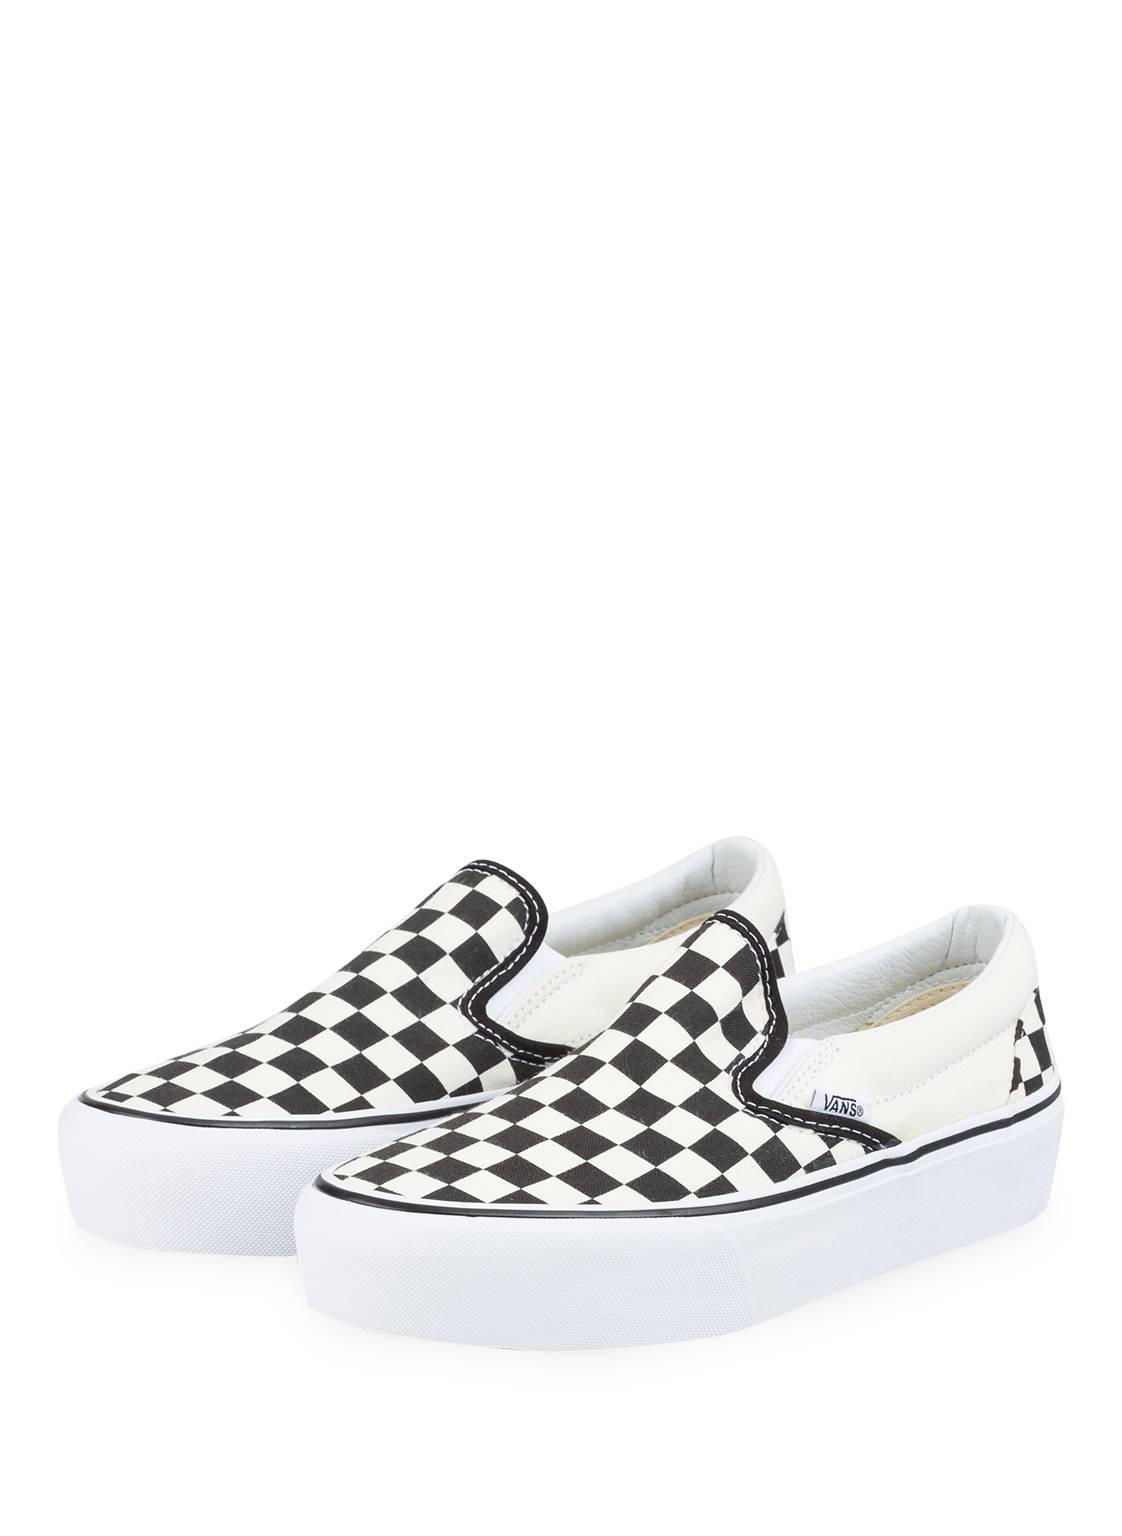 VANS Slip-on-Sneaker CLASSIC PLATFORM